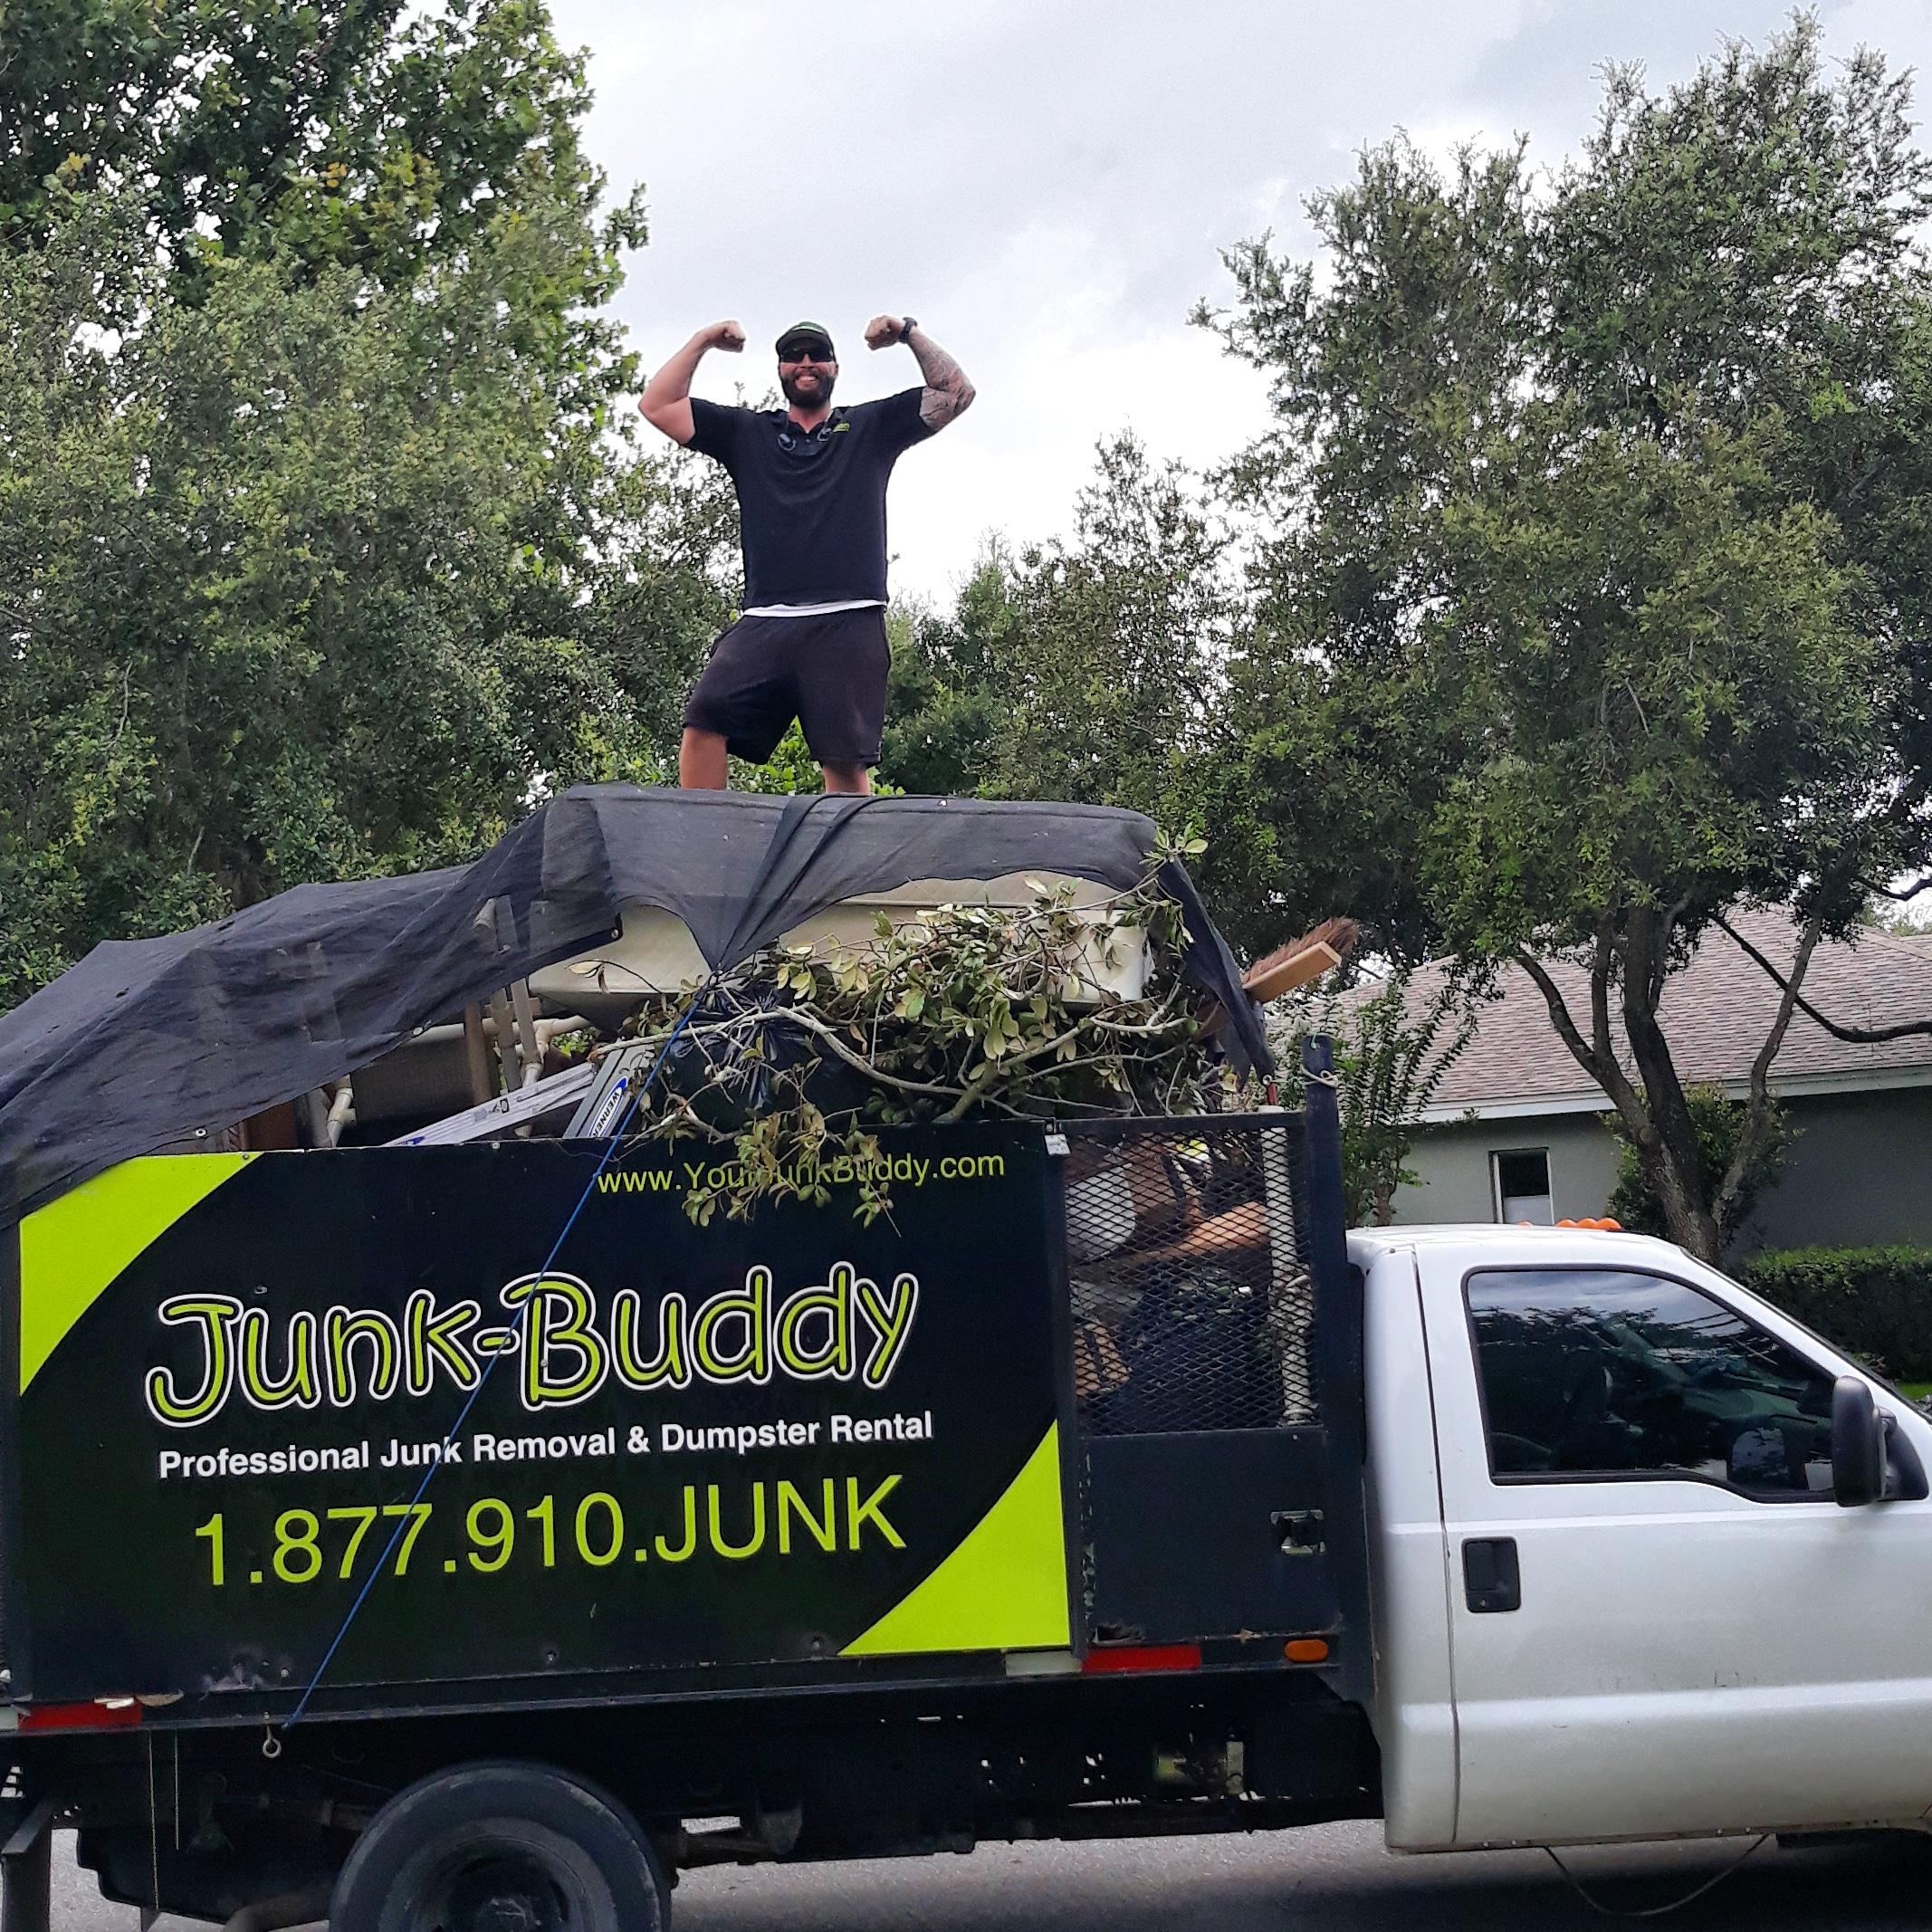 Junk Buddy Belleair Florida Junk Removal